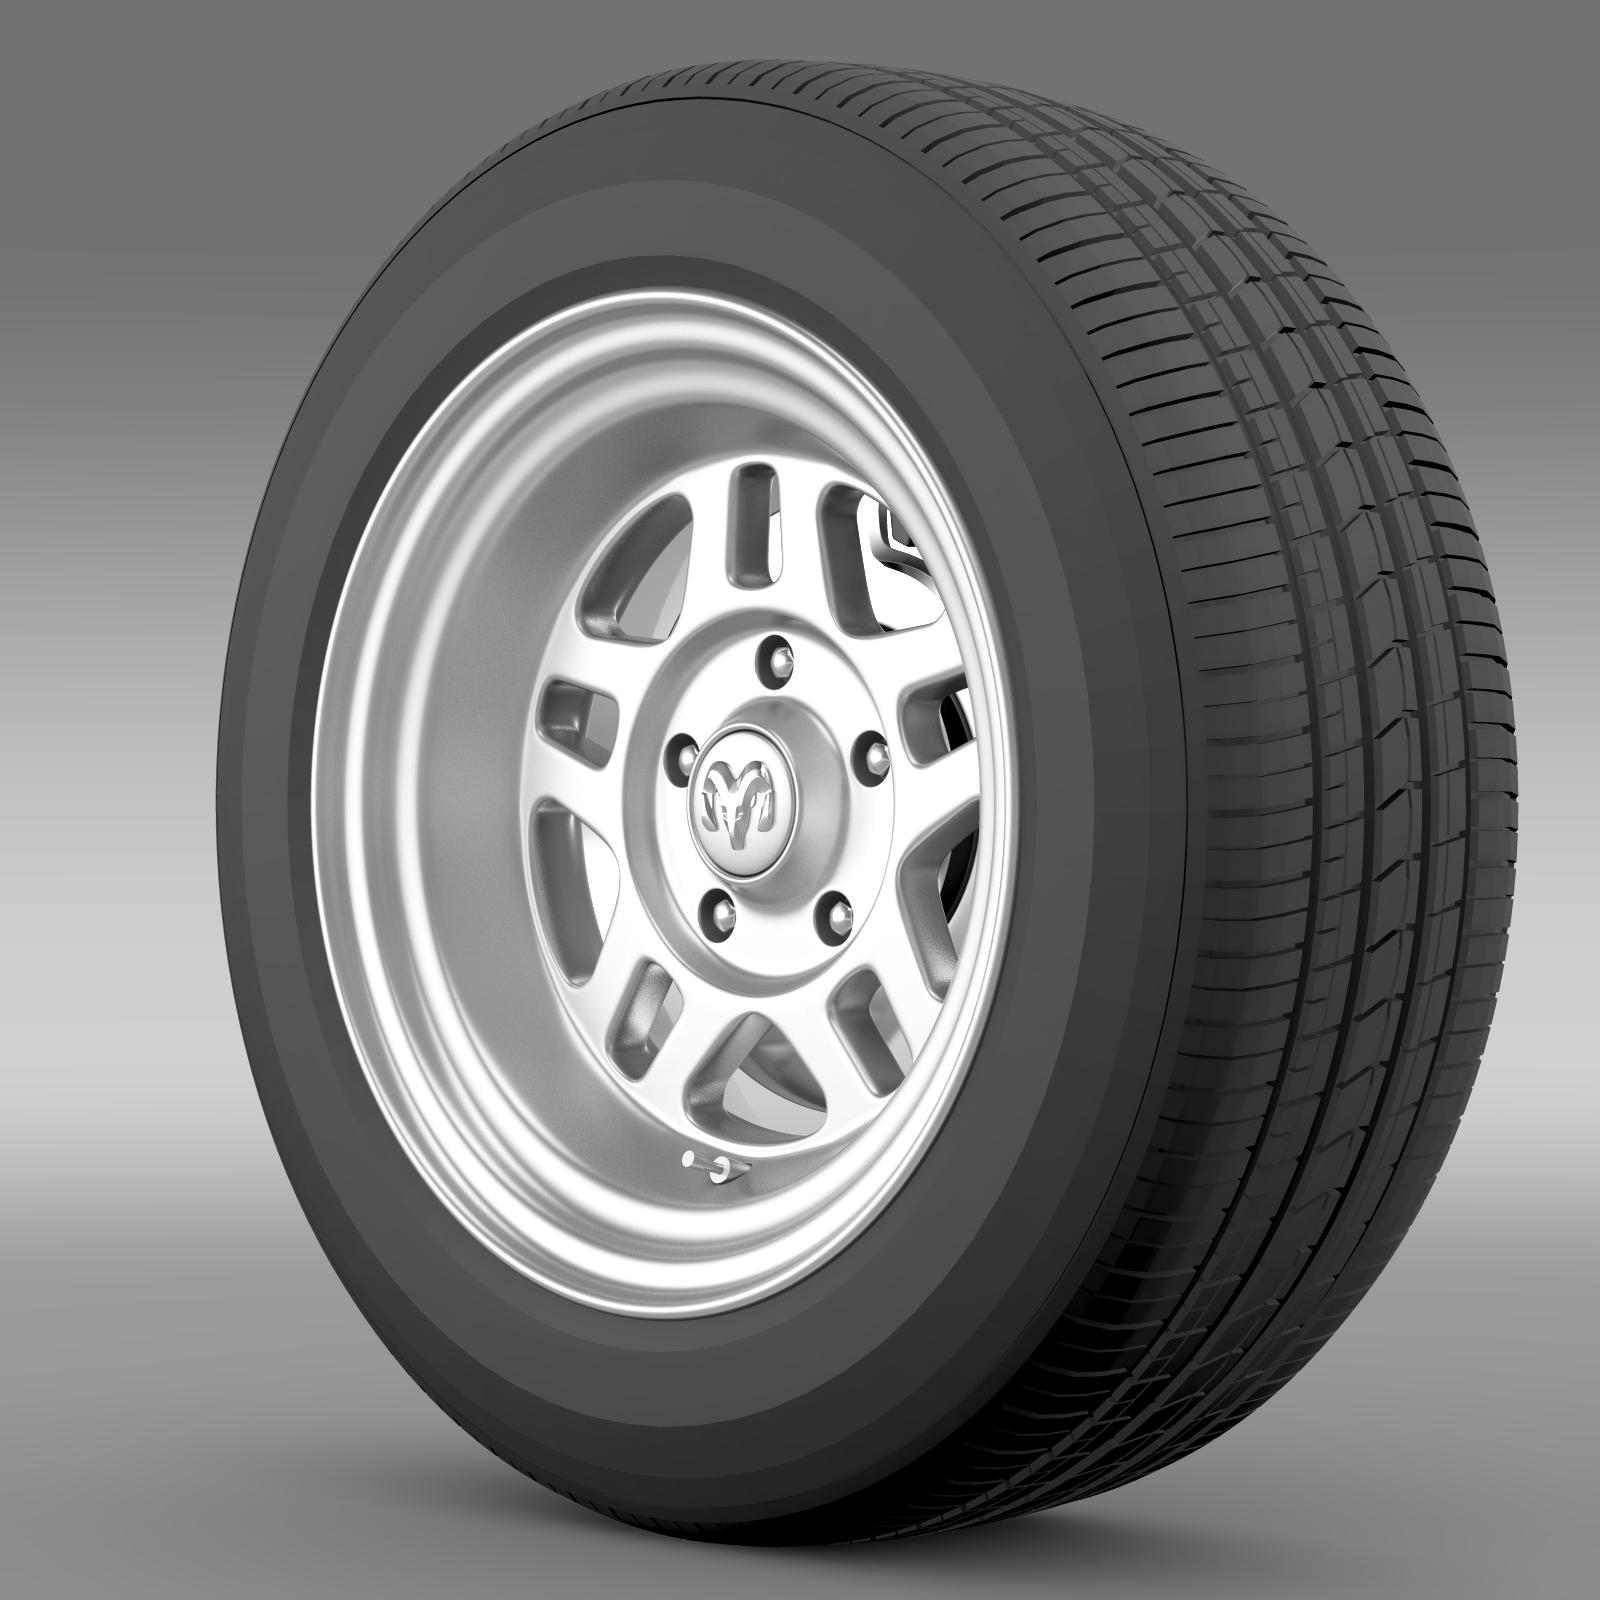 Dodge Challenger Mopar wheel 3d model 3ds max fbx c4d lwo lws lw ma mb  obj 212807